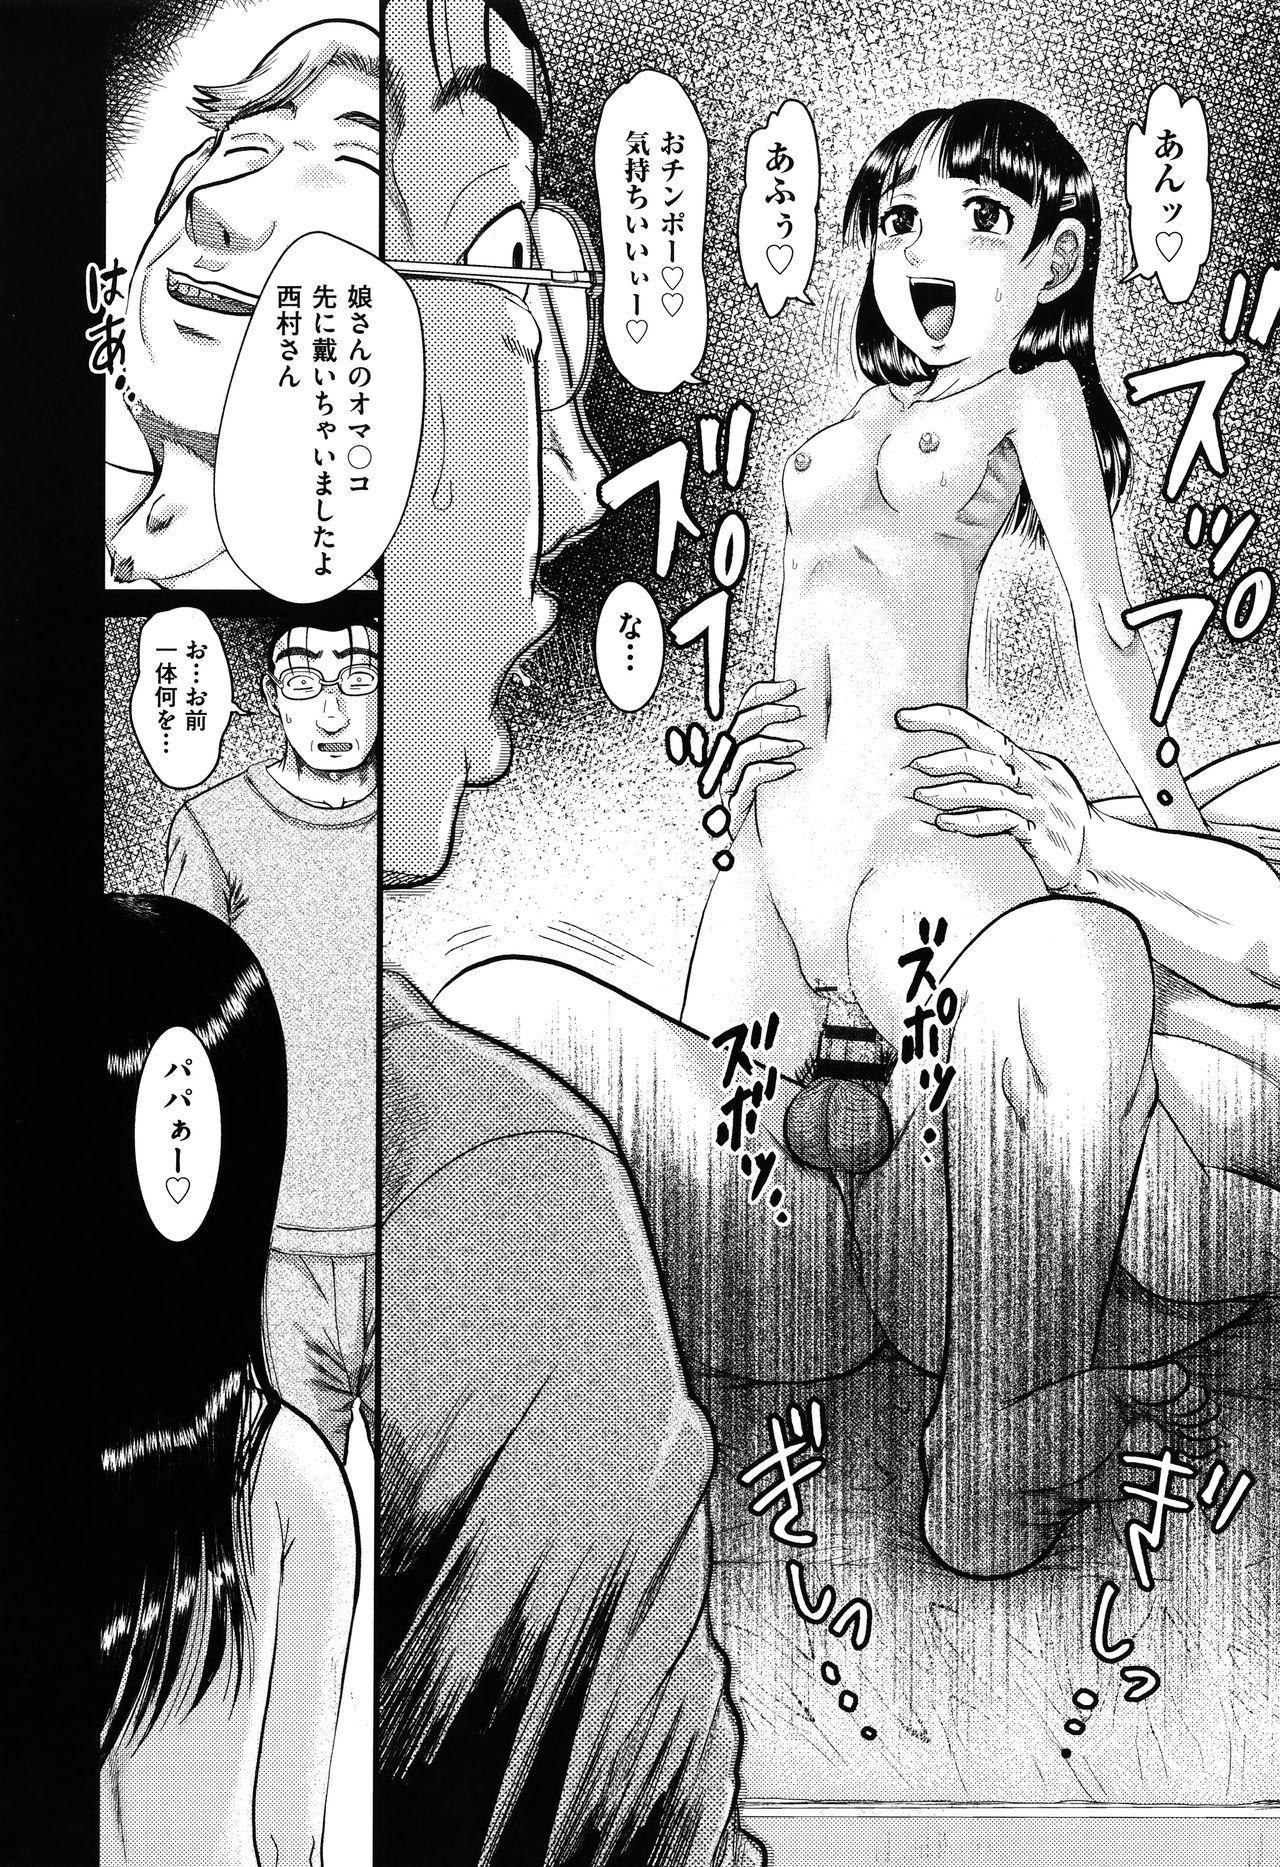 Shoujo Kumikyoku 17 80